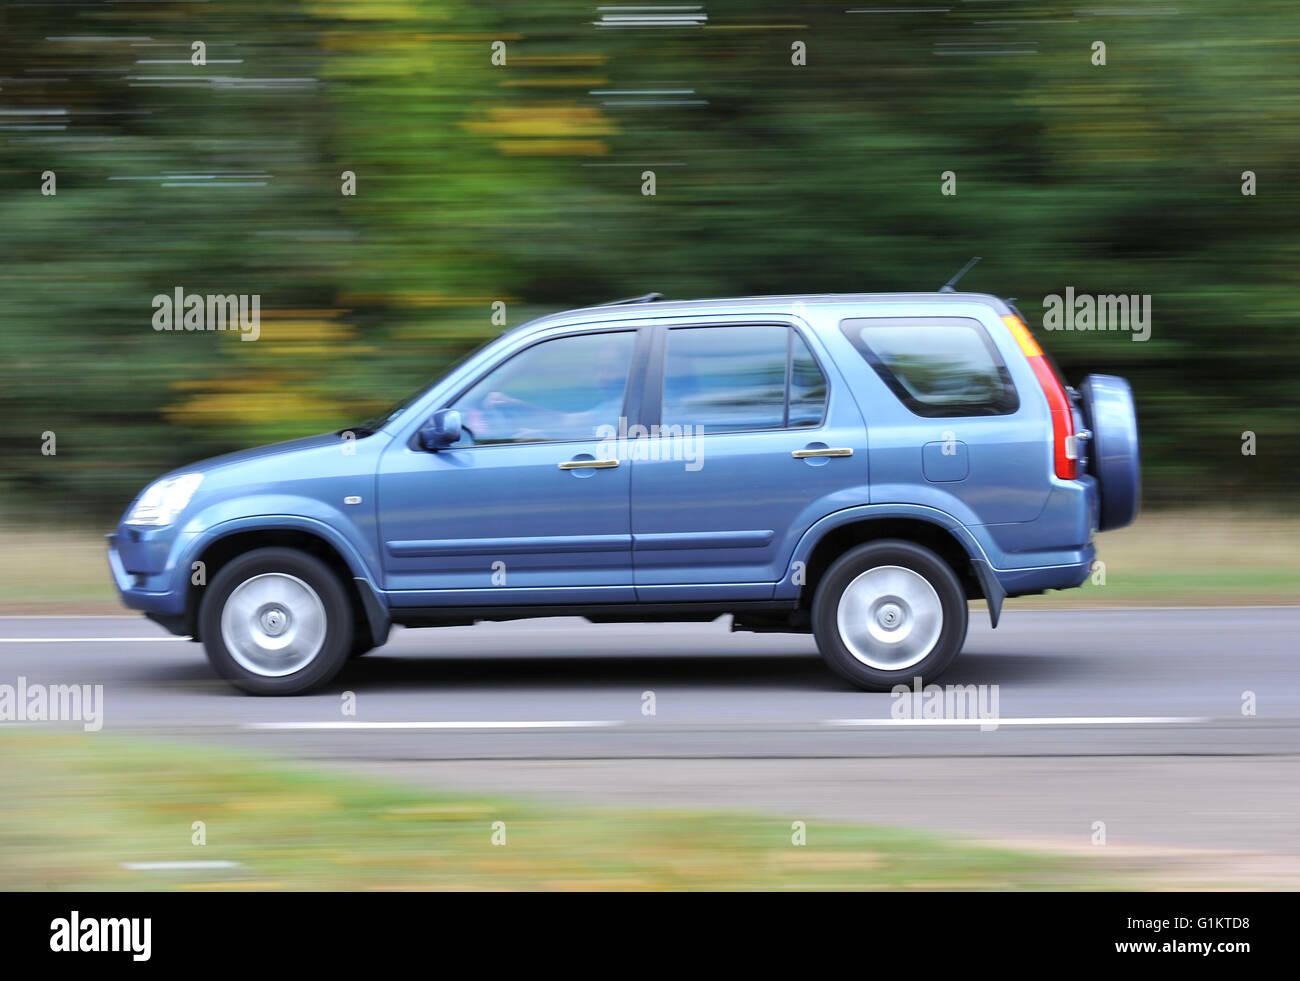 2001 - 2006 Honda CRV SUV car - Stock Image